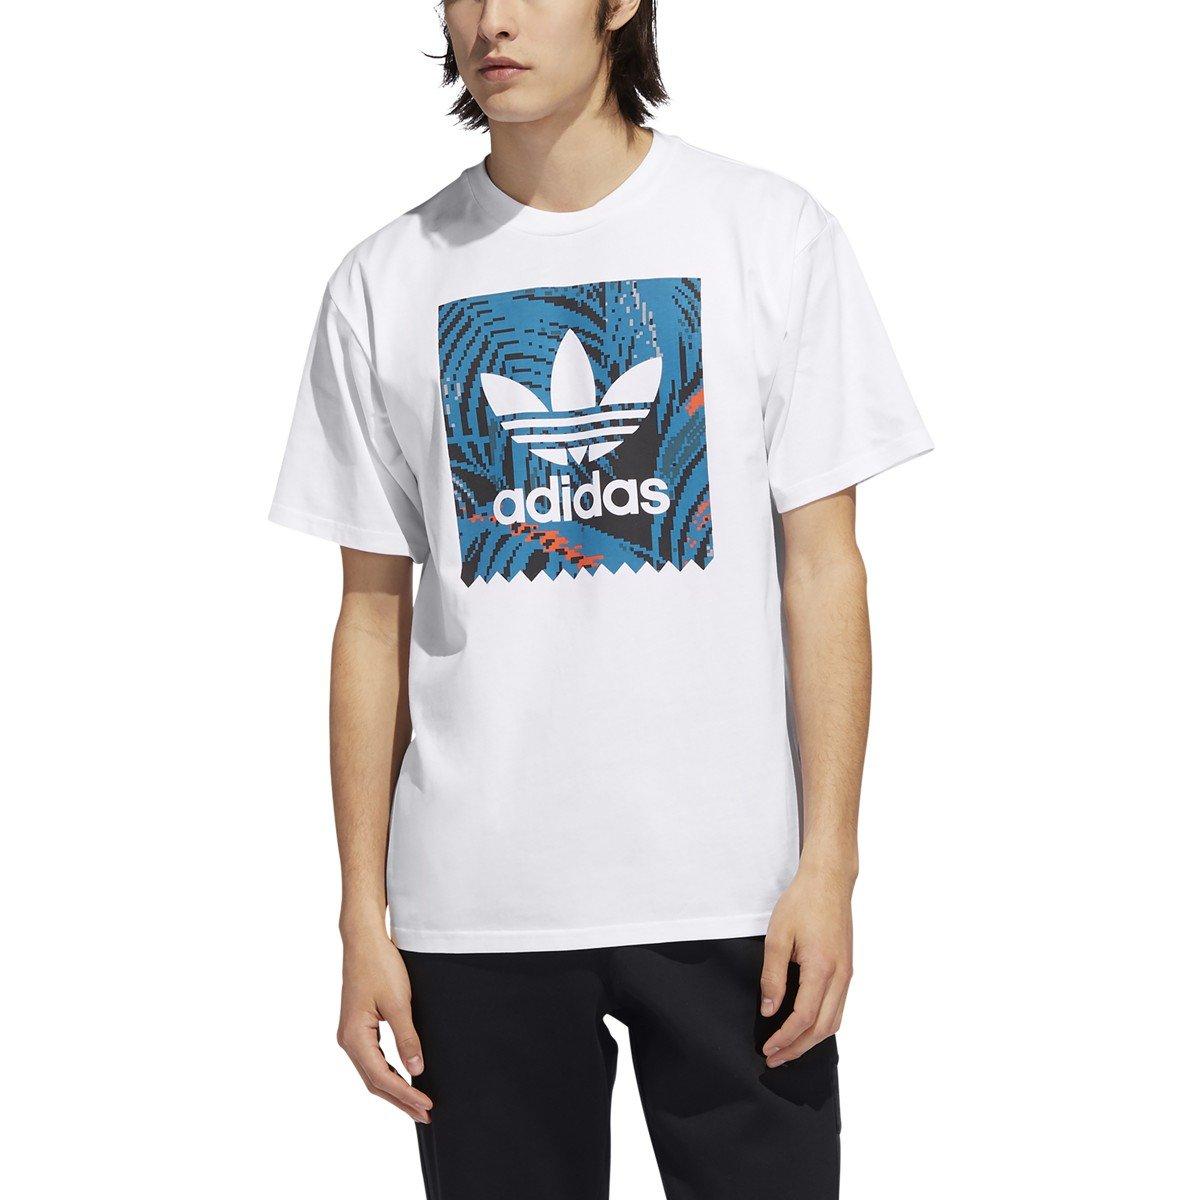 Adidas BB Print s/s t shirt White/Active Teal/Active Orange